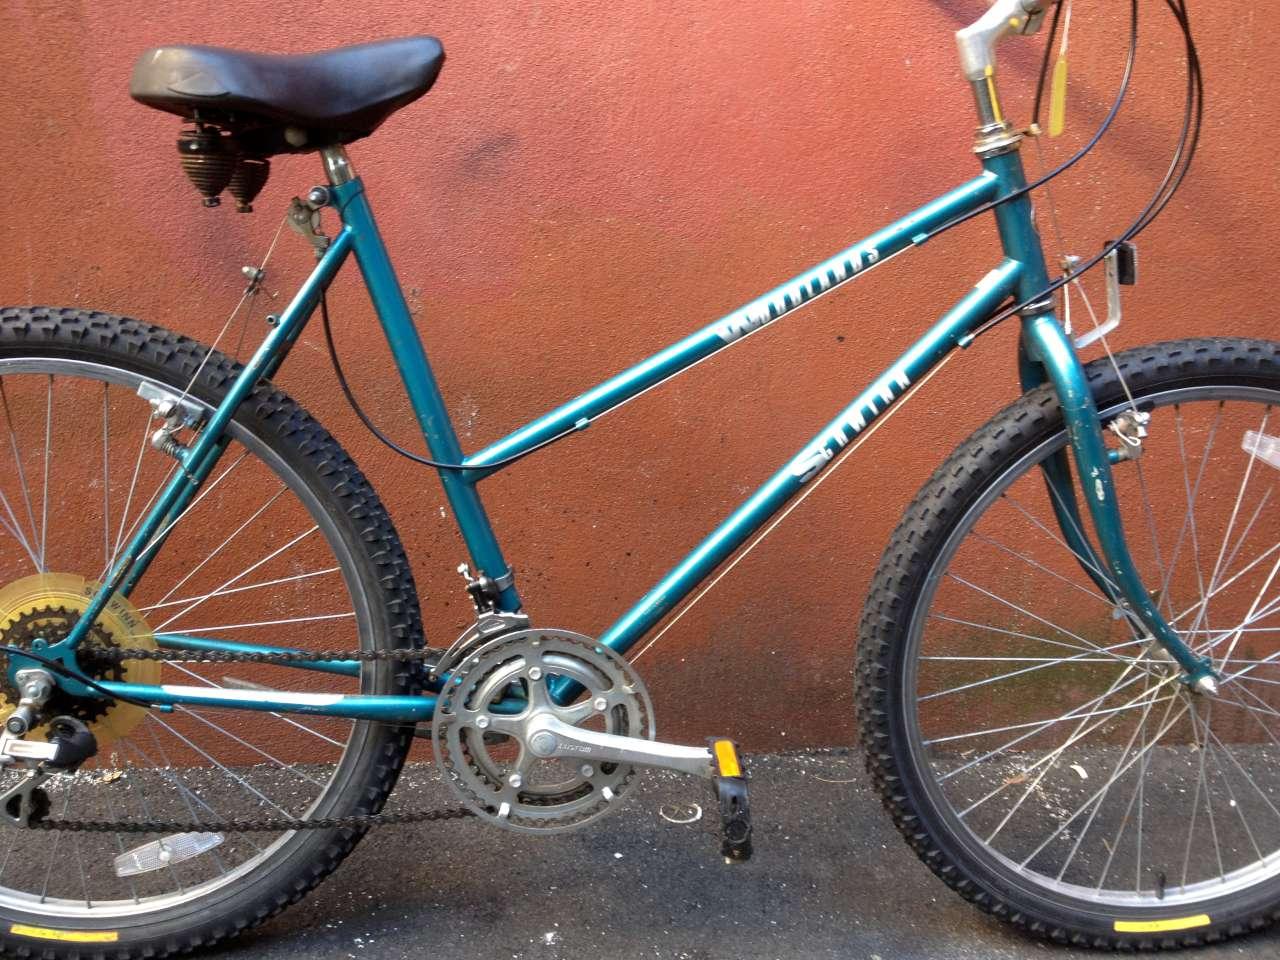 Bicycle Tune Up >> Bike Boom refurbished bikes: 1986 (?) Schwinn woodlands